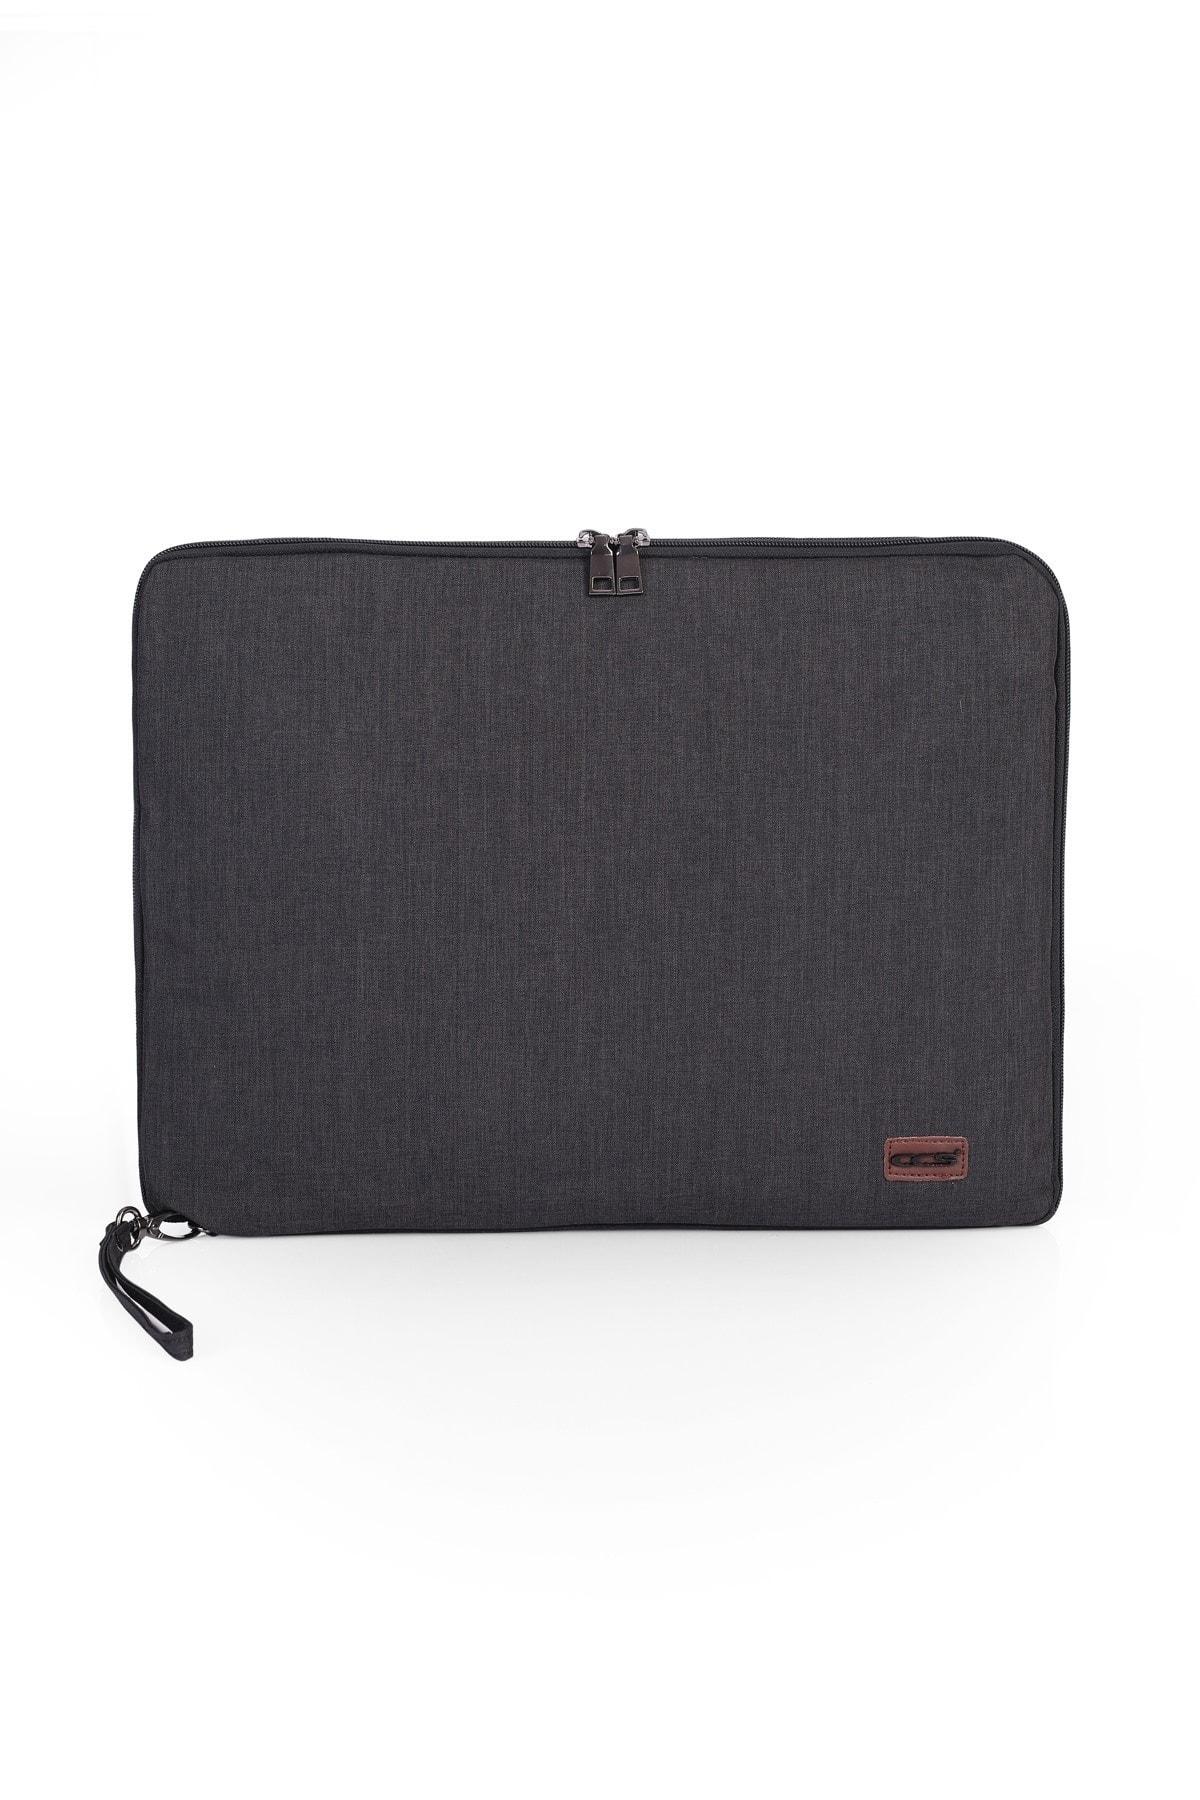 ÇÇS 31282 Laptop Tablet El Çantası 1